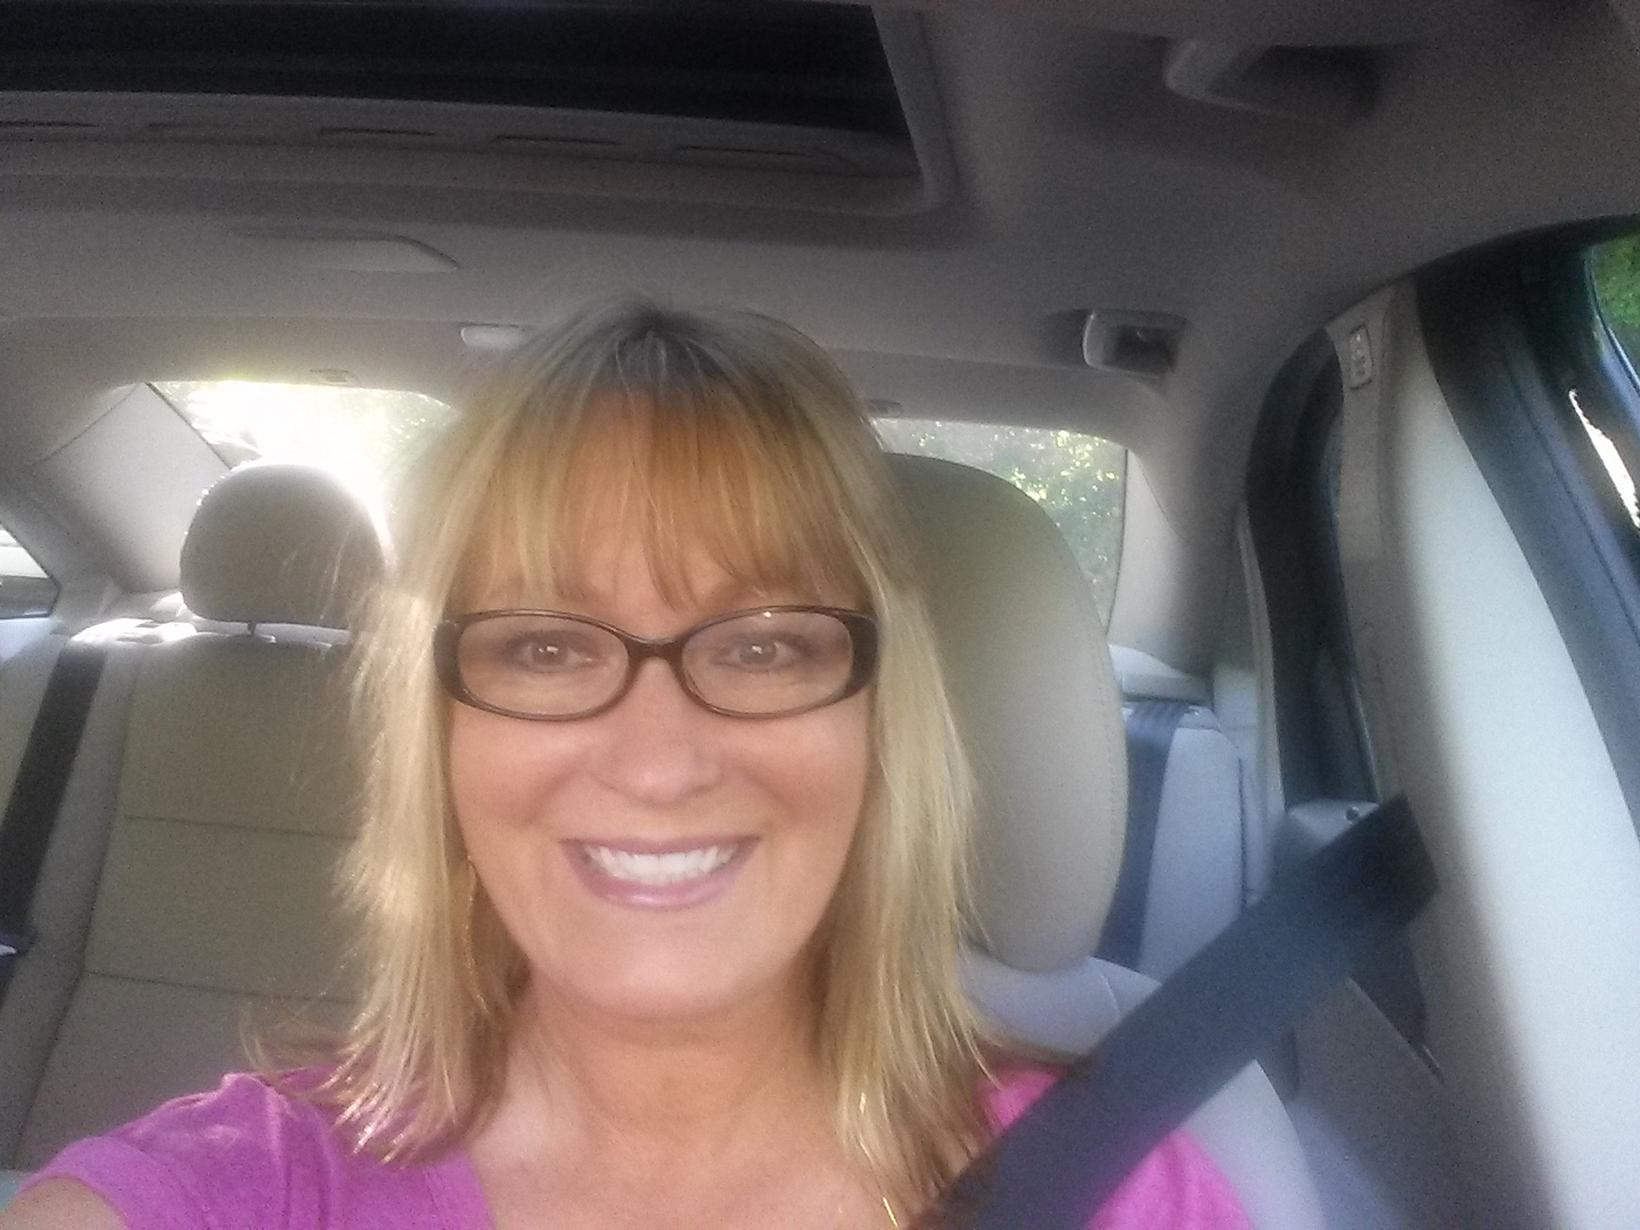 Shauna from Portland, Oregon, United States